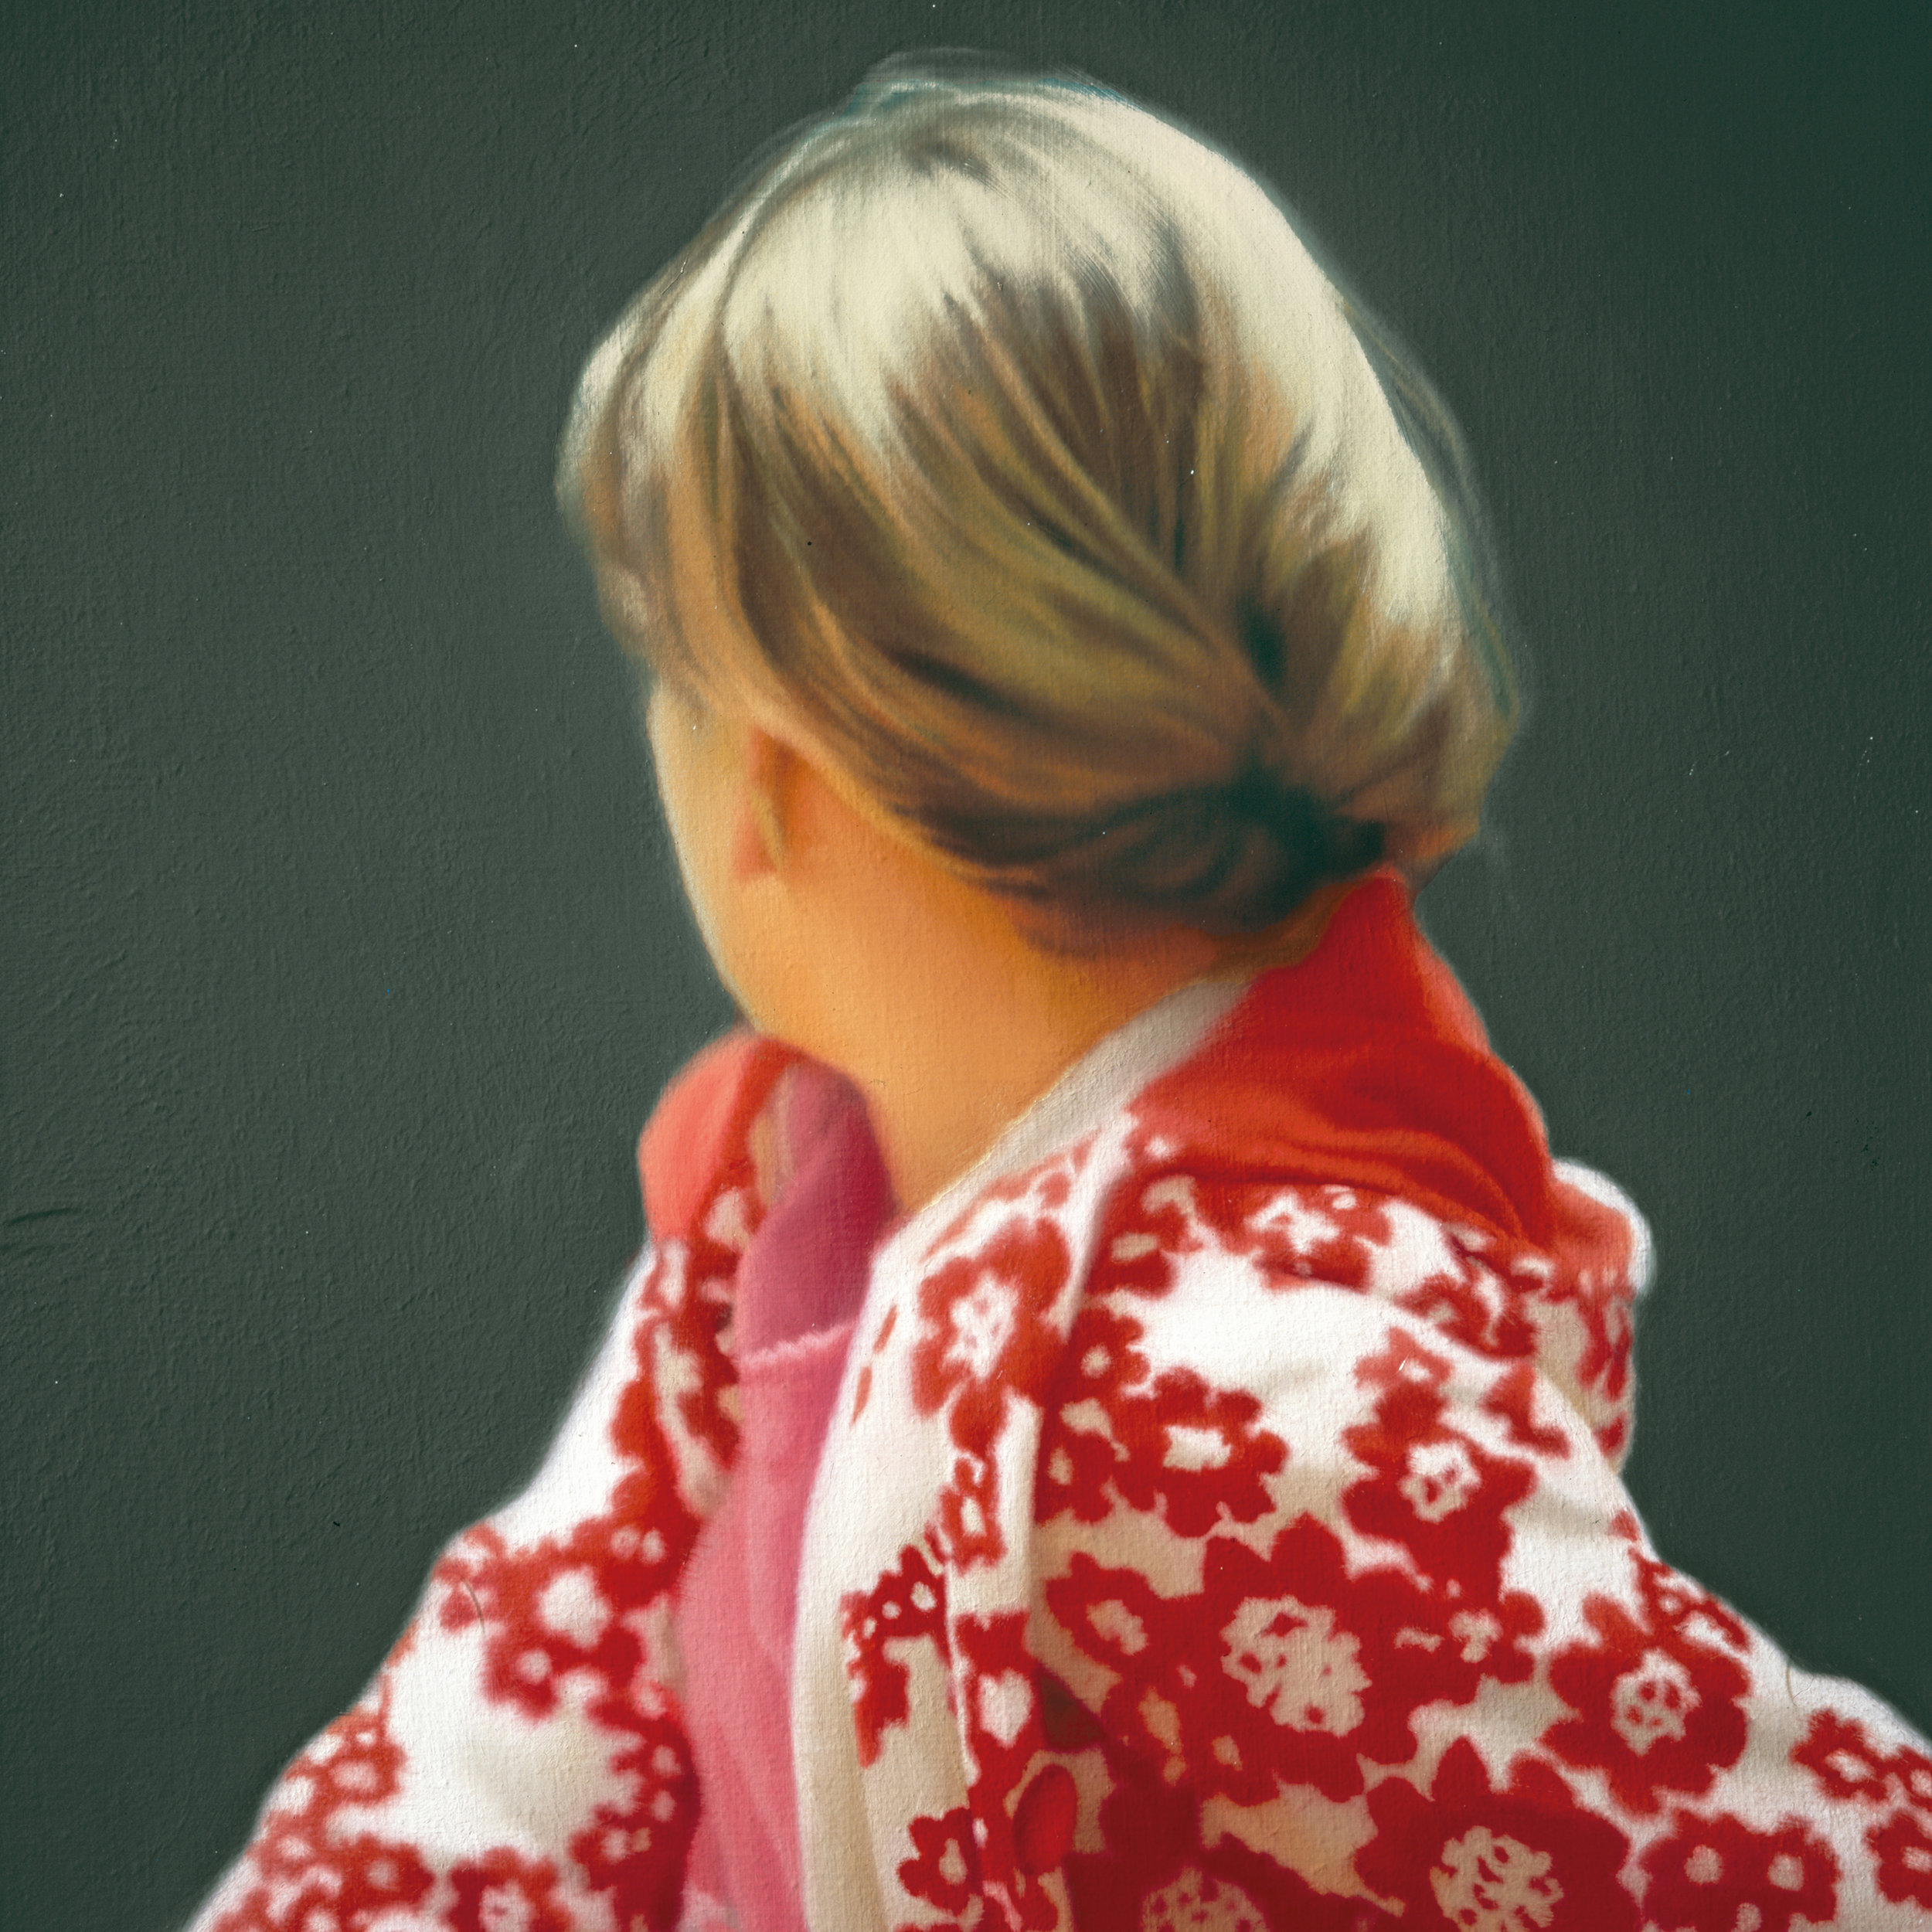 Gerhard Richter -